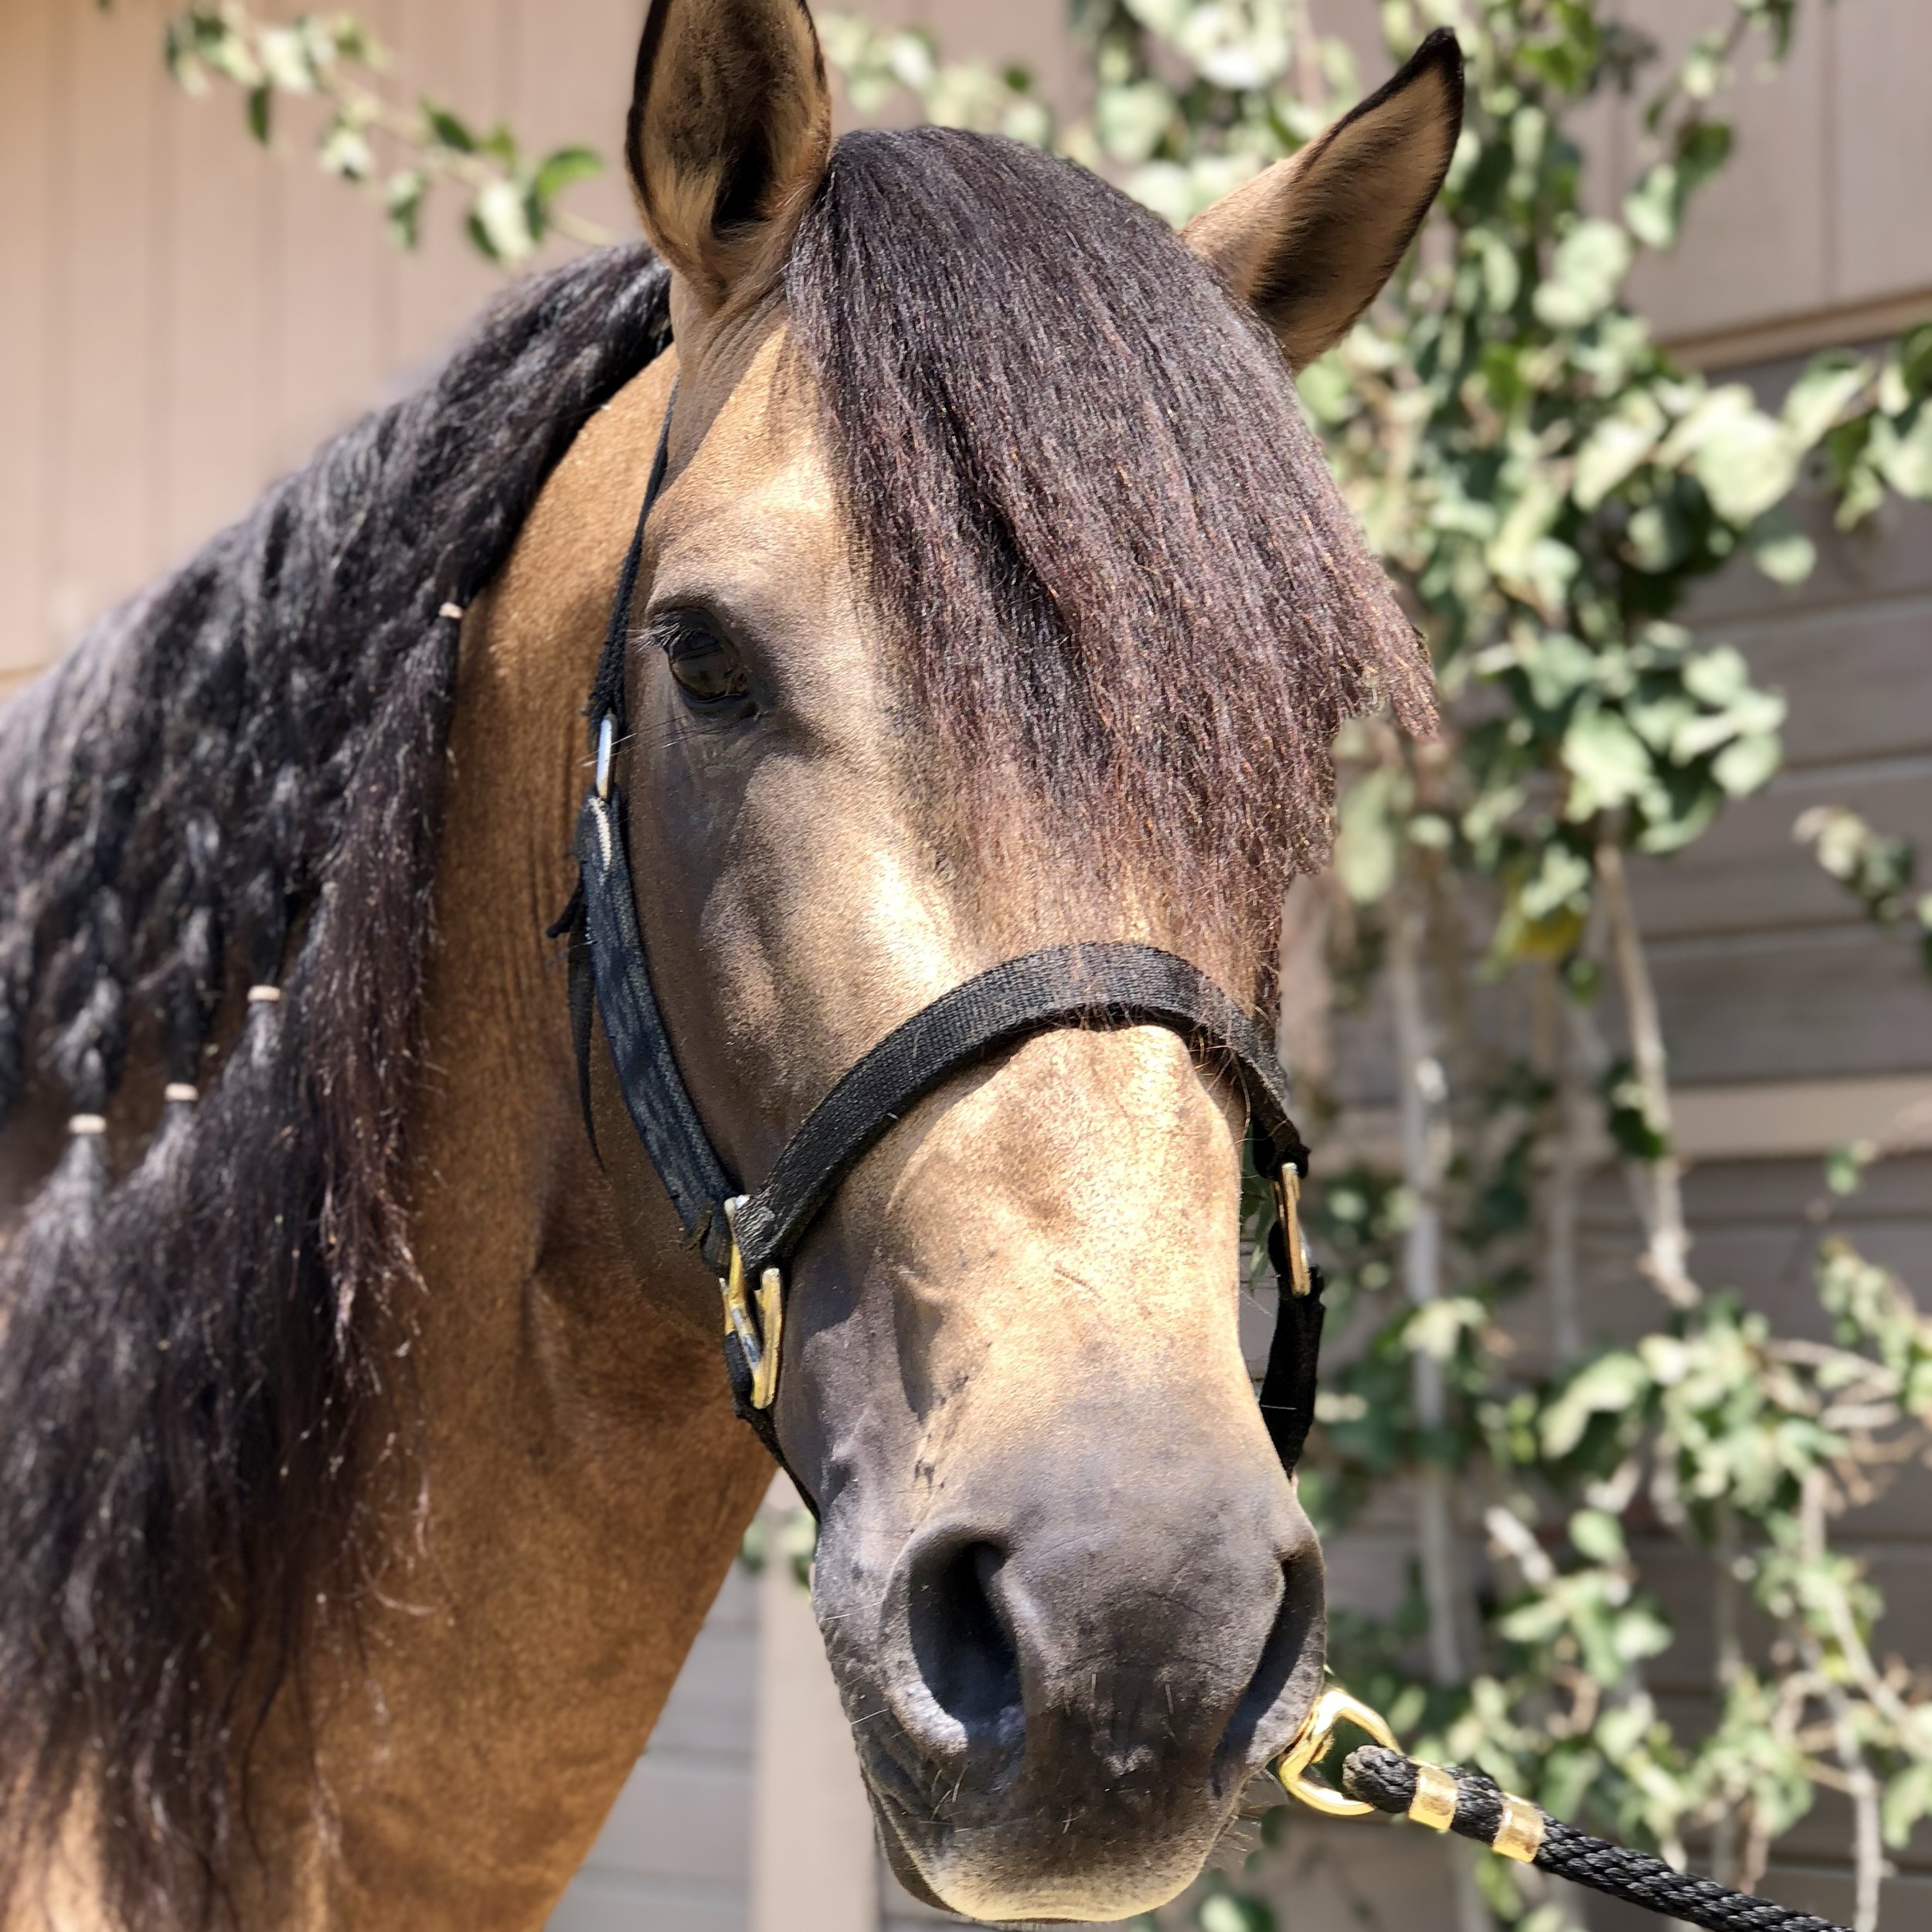 Huec-aran - Huec-aran is a buckskin PRE stallion owed by Lisa Hathaway.